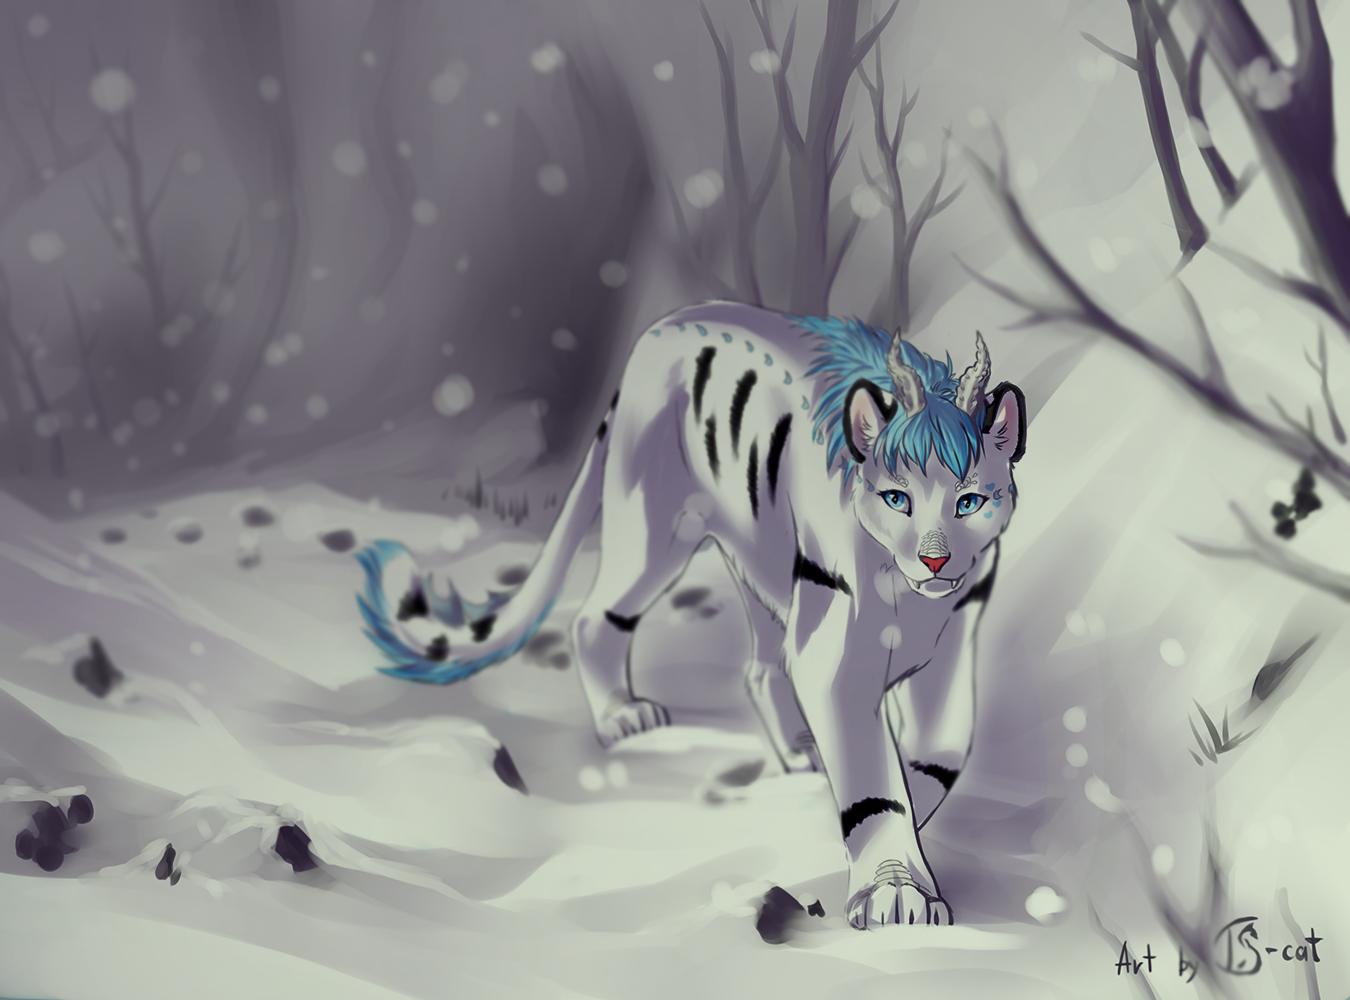 e926 ambiguous_gender blue_eyes blue_hair cat day detailed_background digital_media_(artwork) feline feral hair horn mammal outside paws snow solo ts-cat